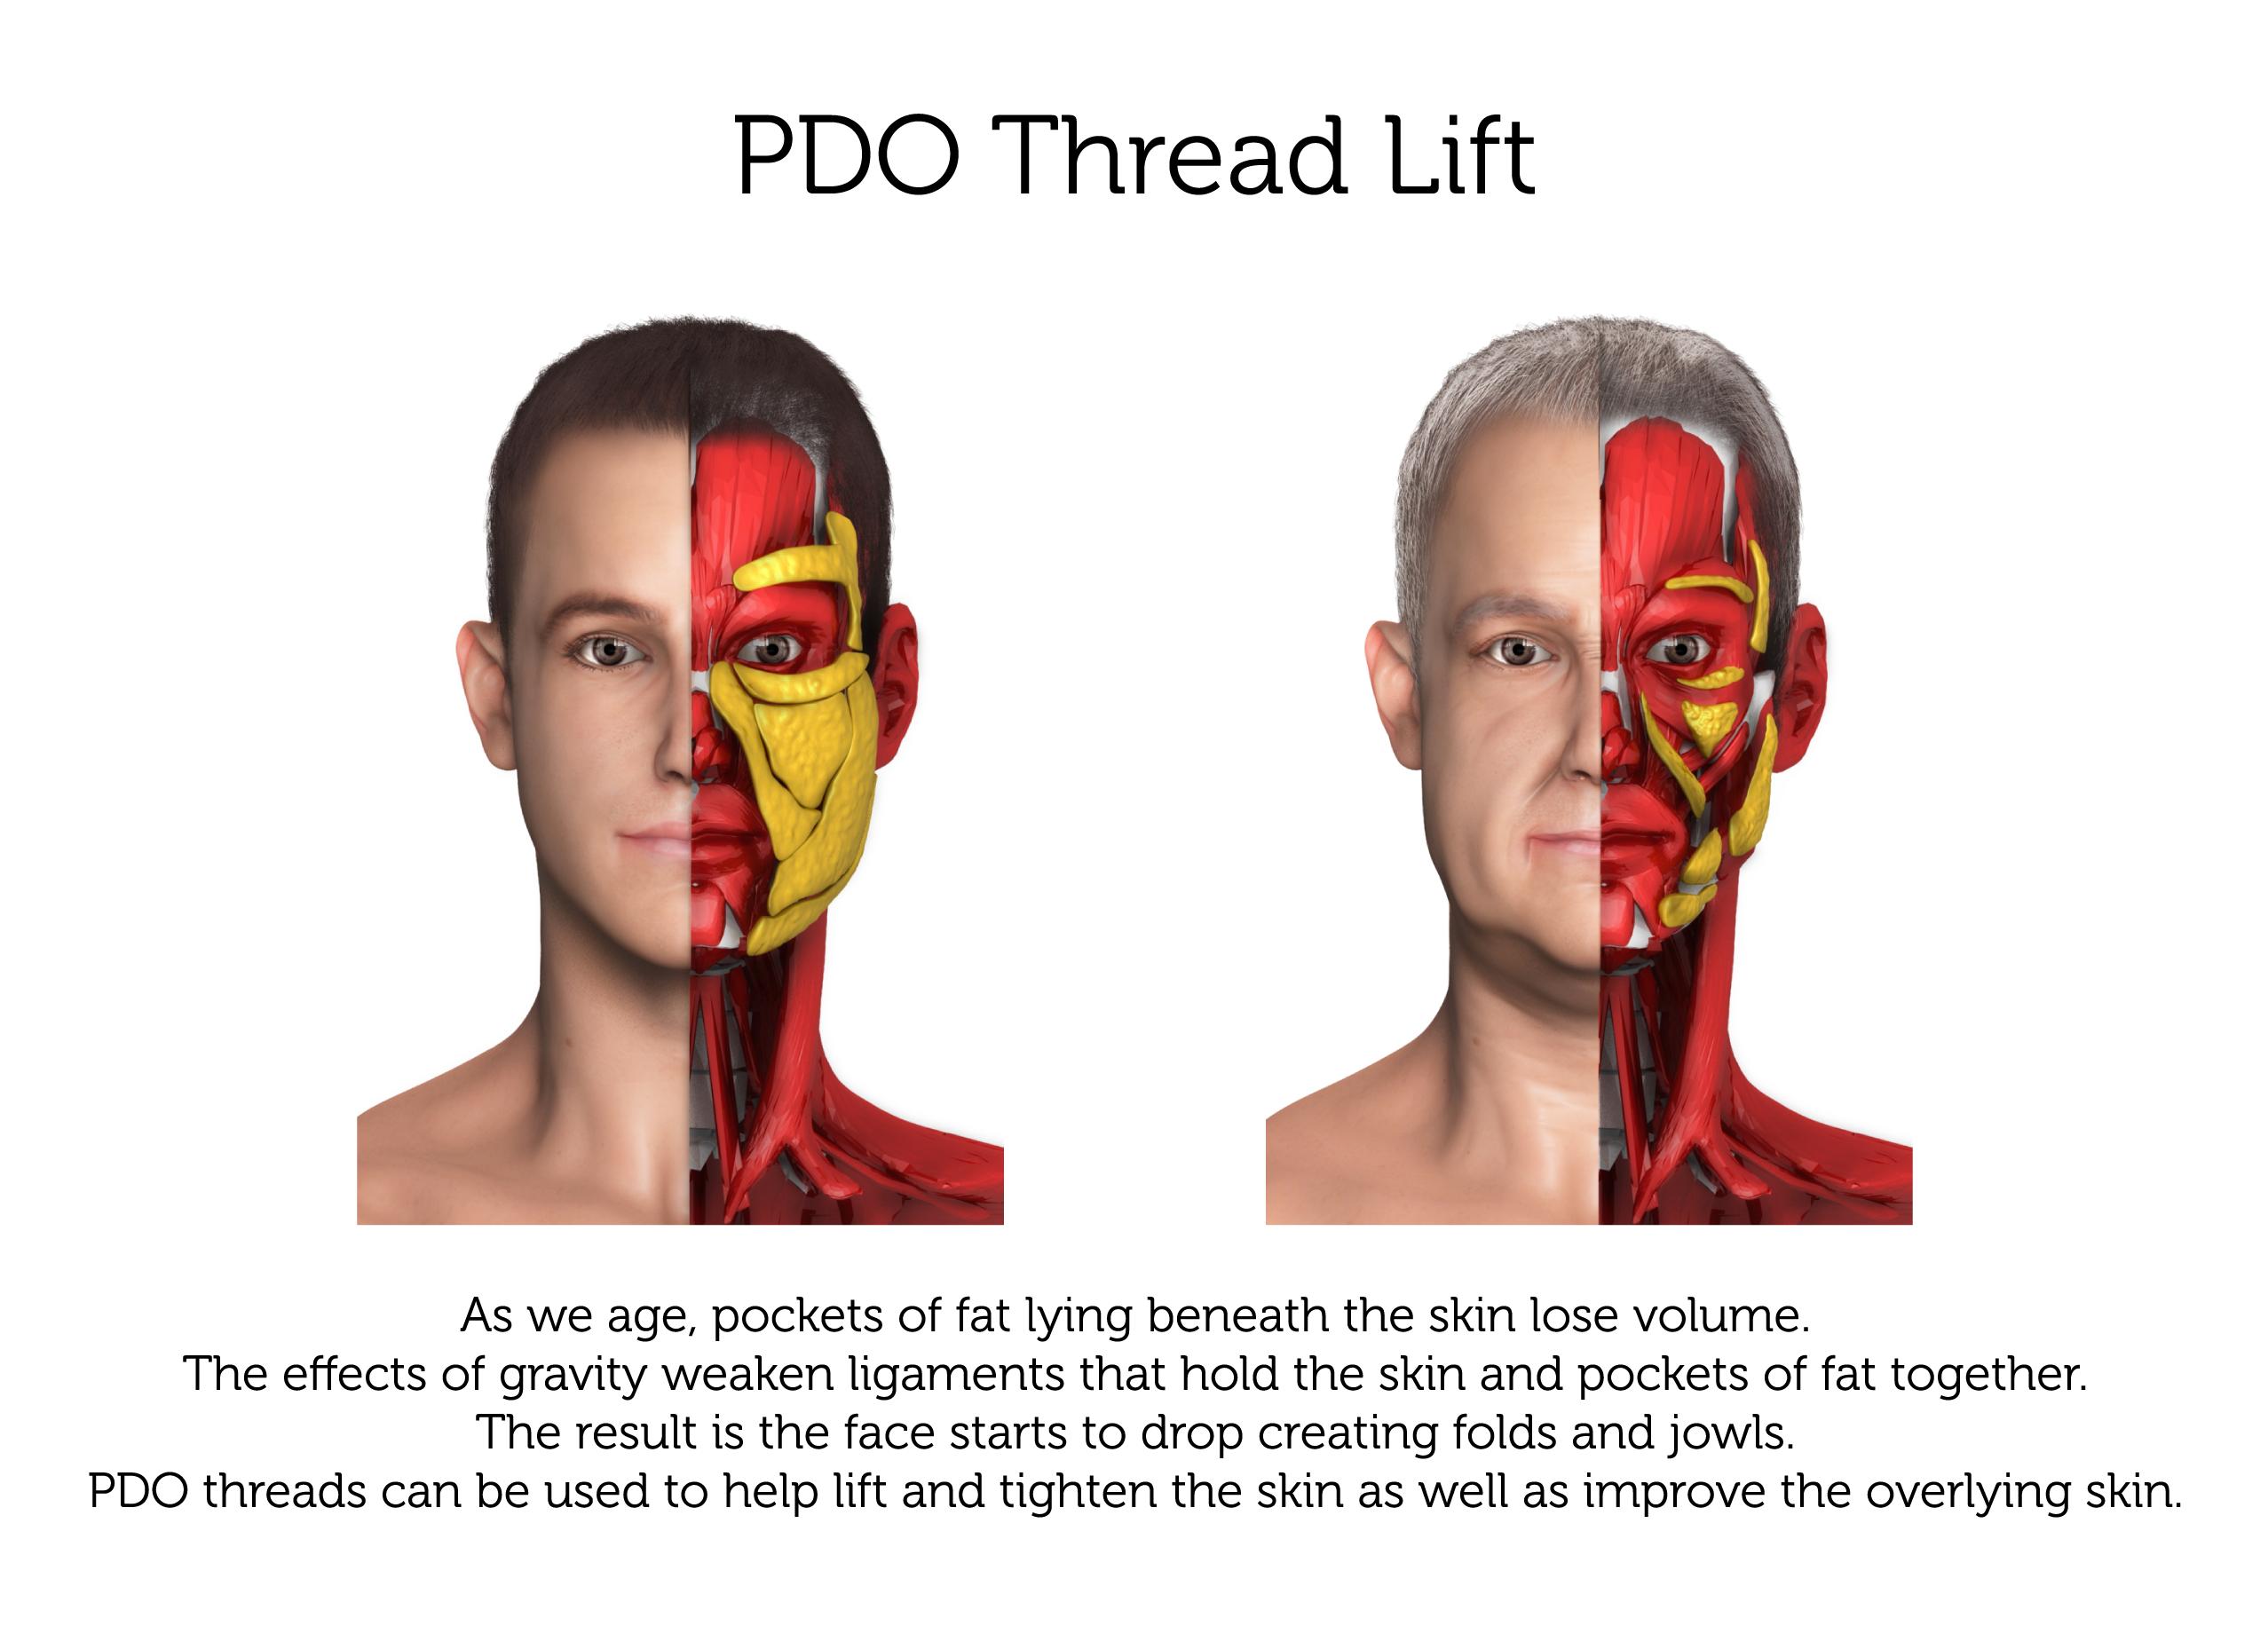 PDO-Thread-Lift-(Male)